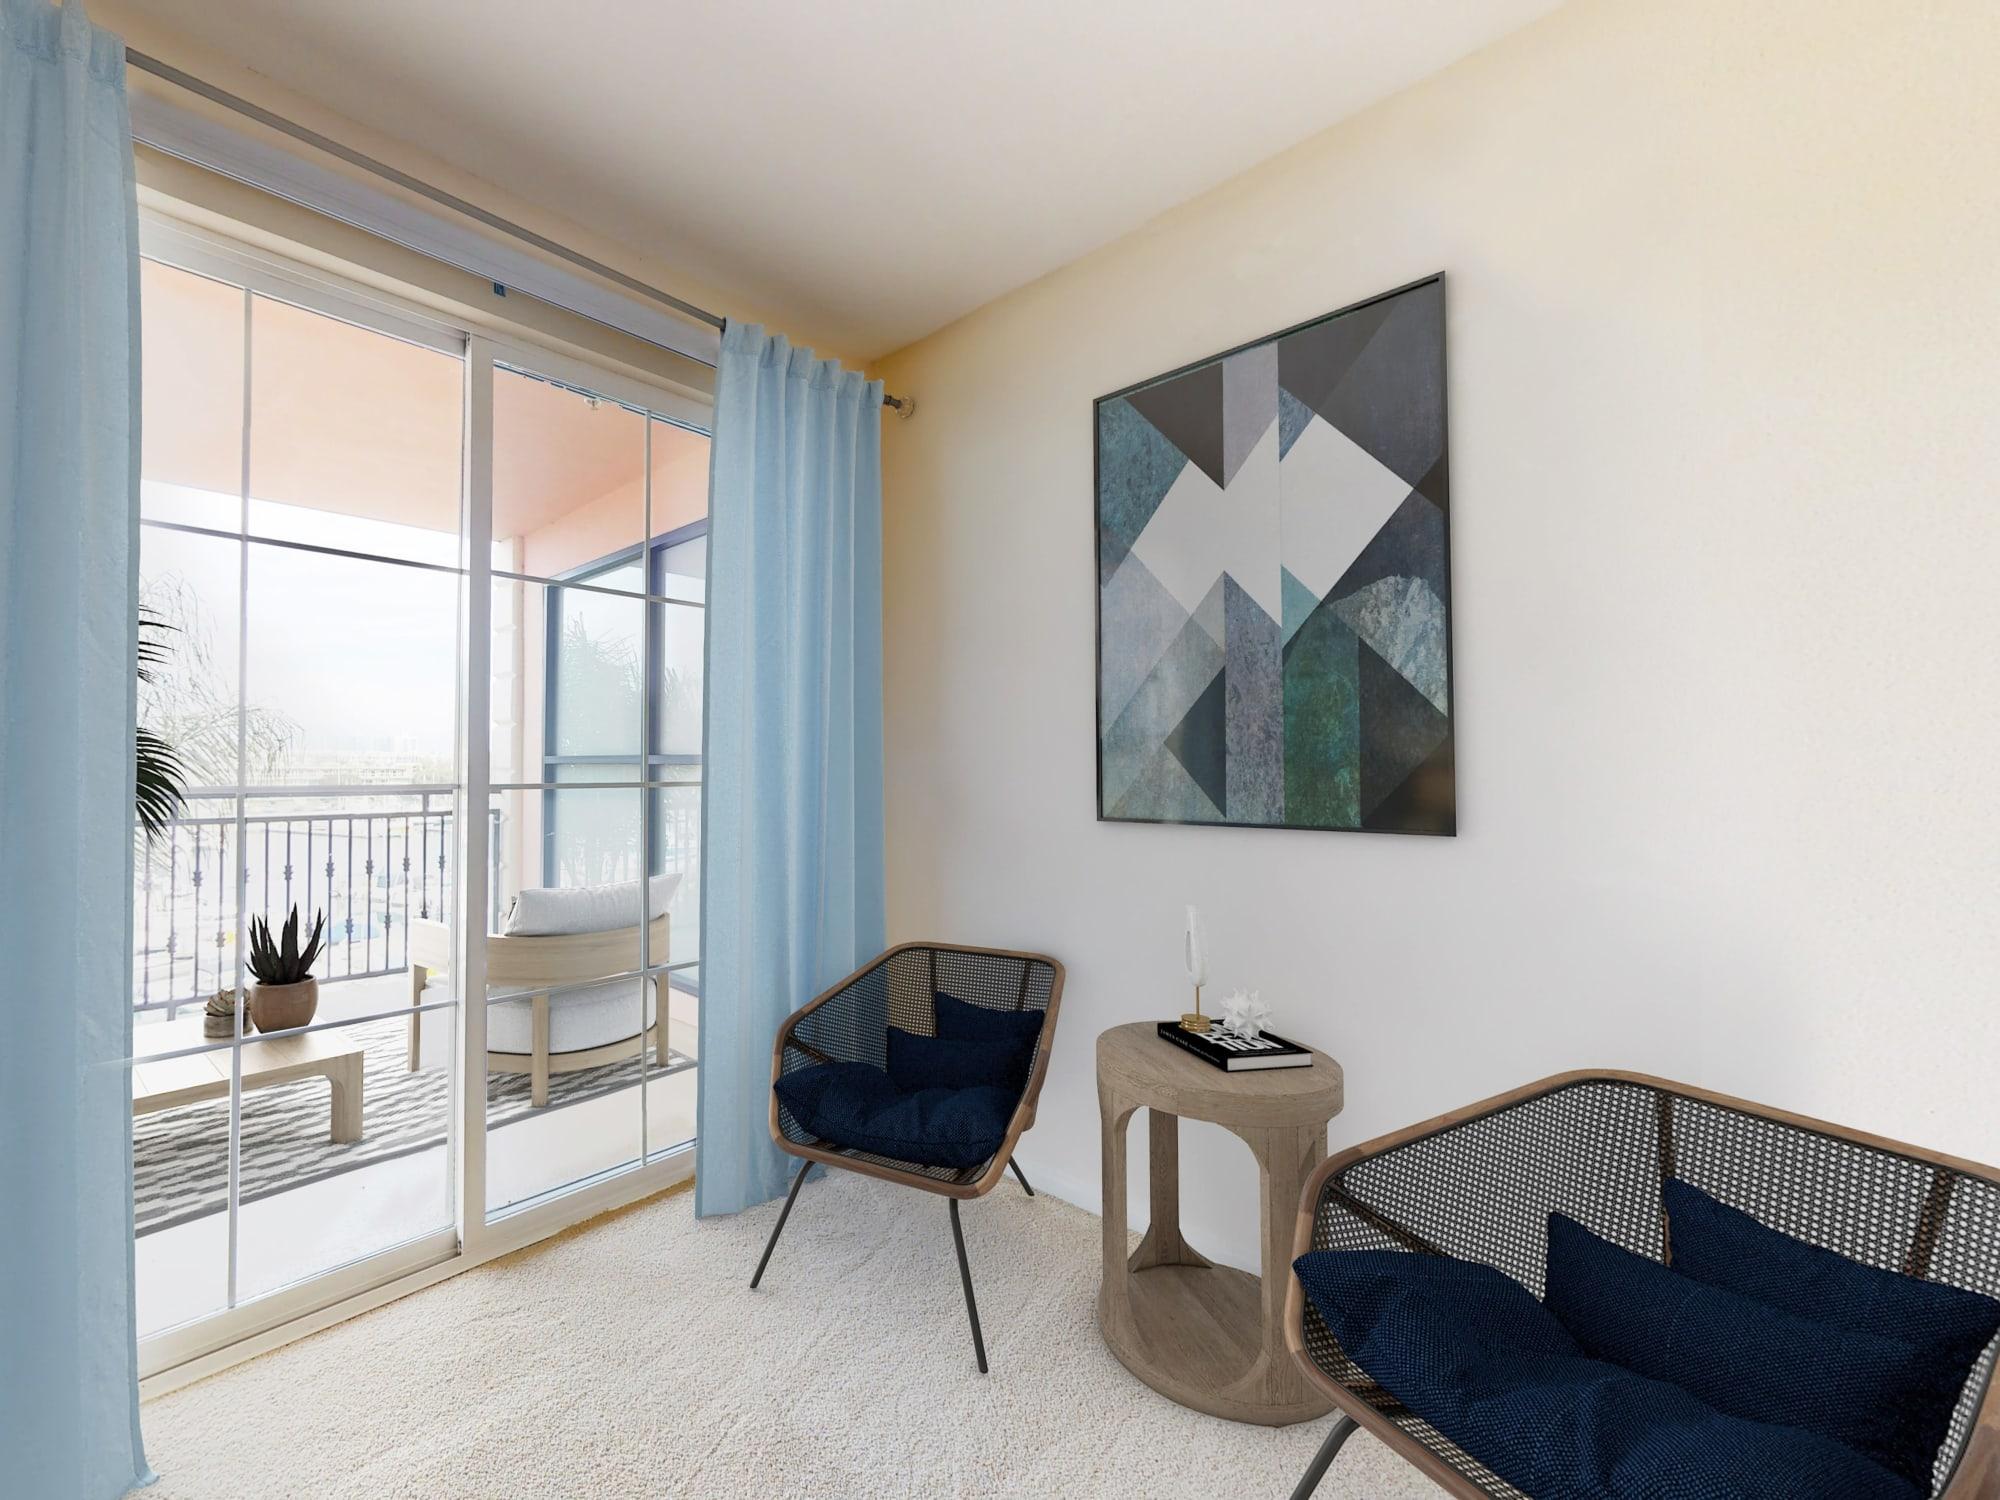 Lounge area inside spacious bedroom with balcony overlooking the marina at The Villa at Marina Harbor in Marina del Rey, California